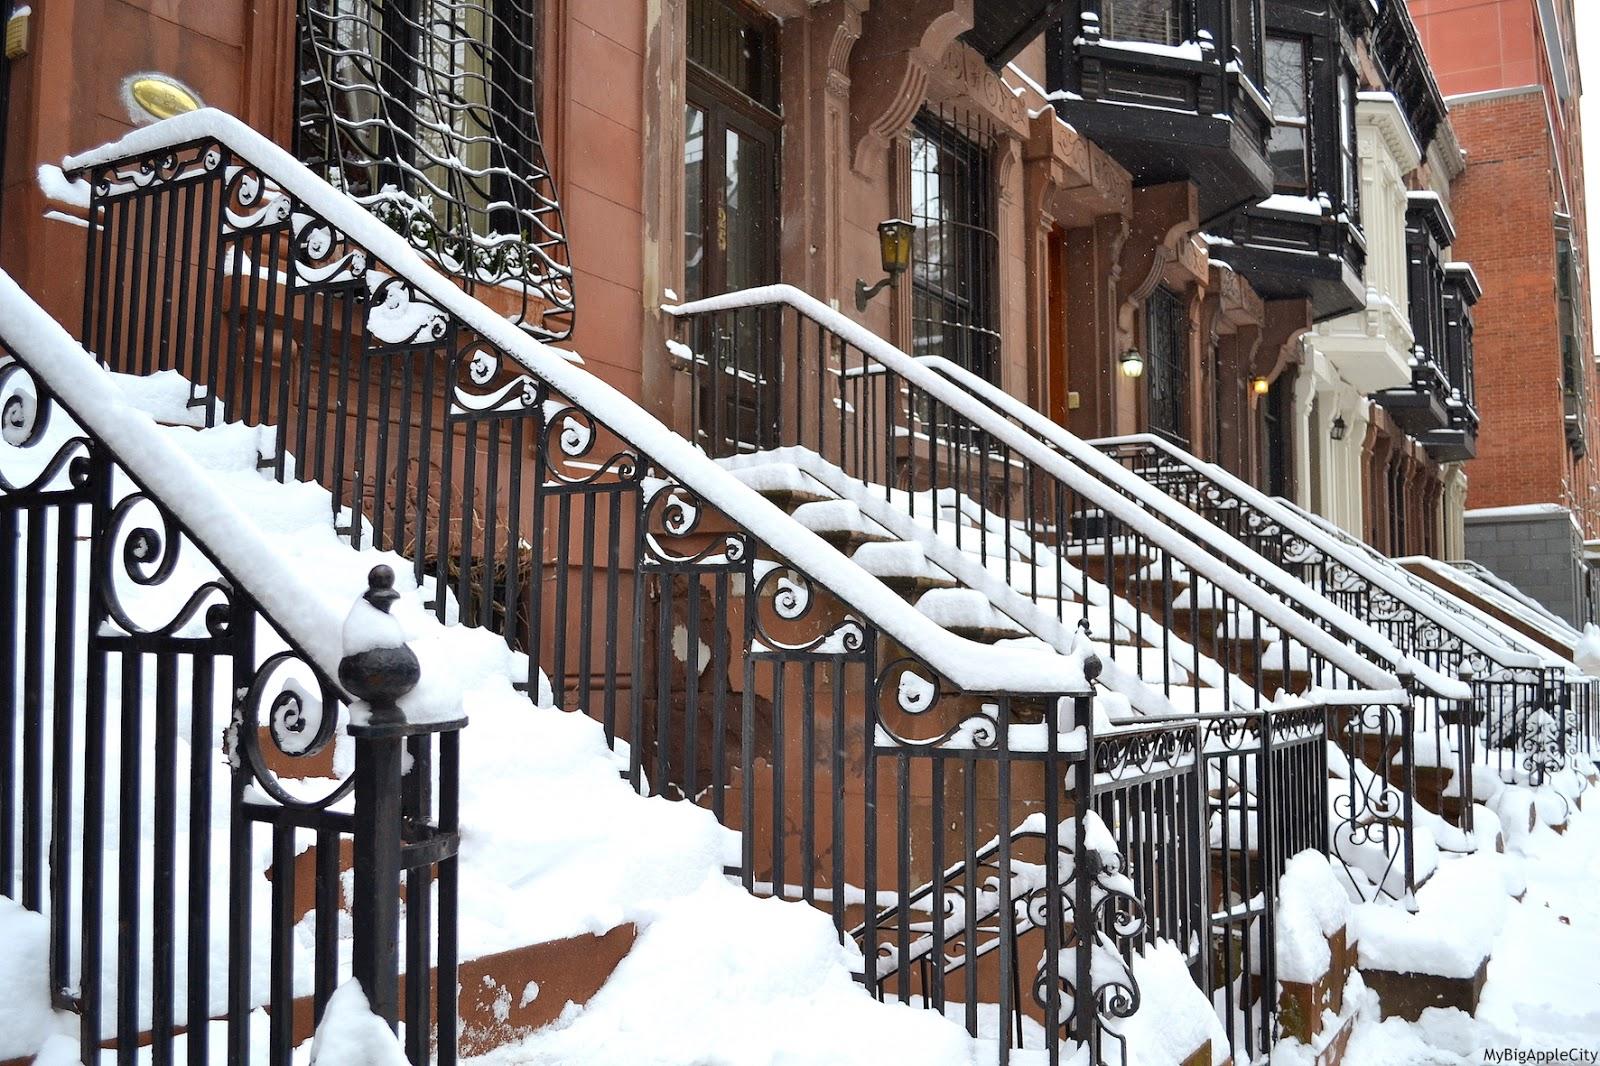 juno-2015-NYC-Blizzard-Travelblog-best-of